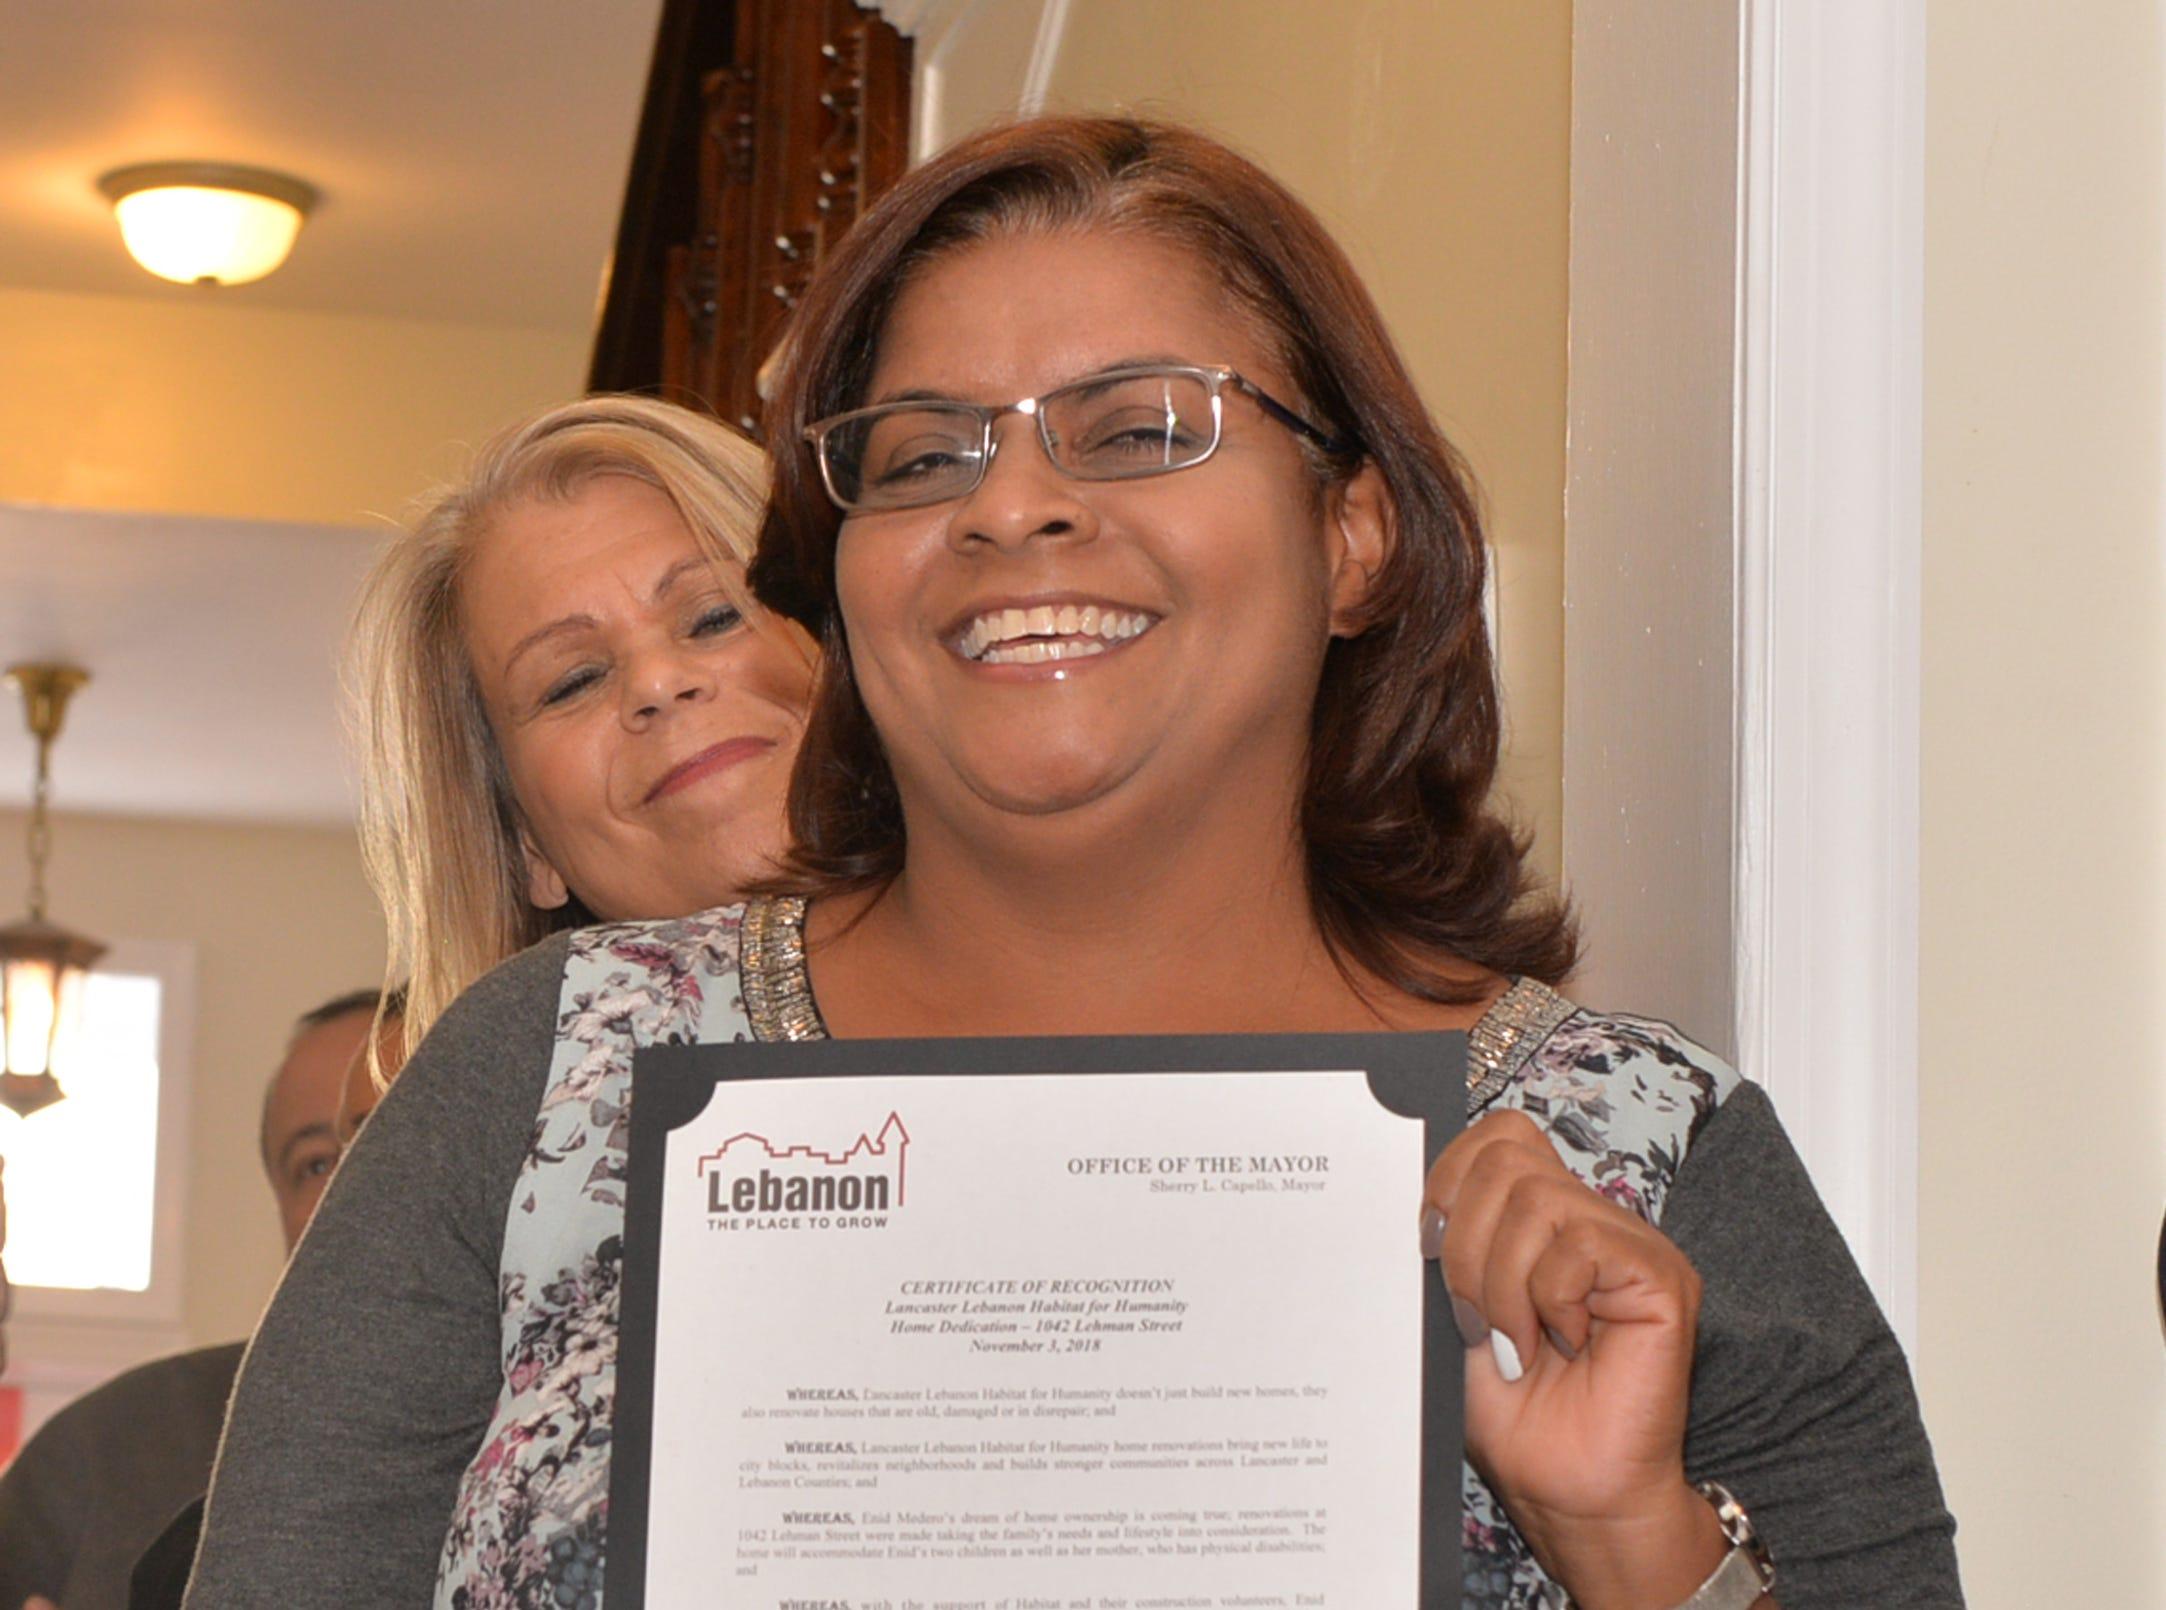 Lancaster Lebanon Habitat for Humanity presented the keys to 1042 Lehman Street, Lebanon to Enid Medero and her family on Saturday, November 3, 2018.